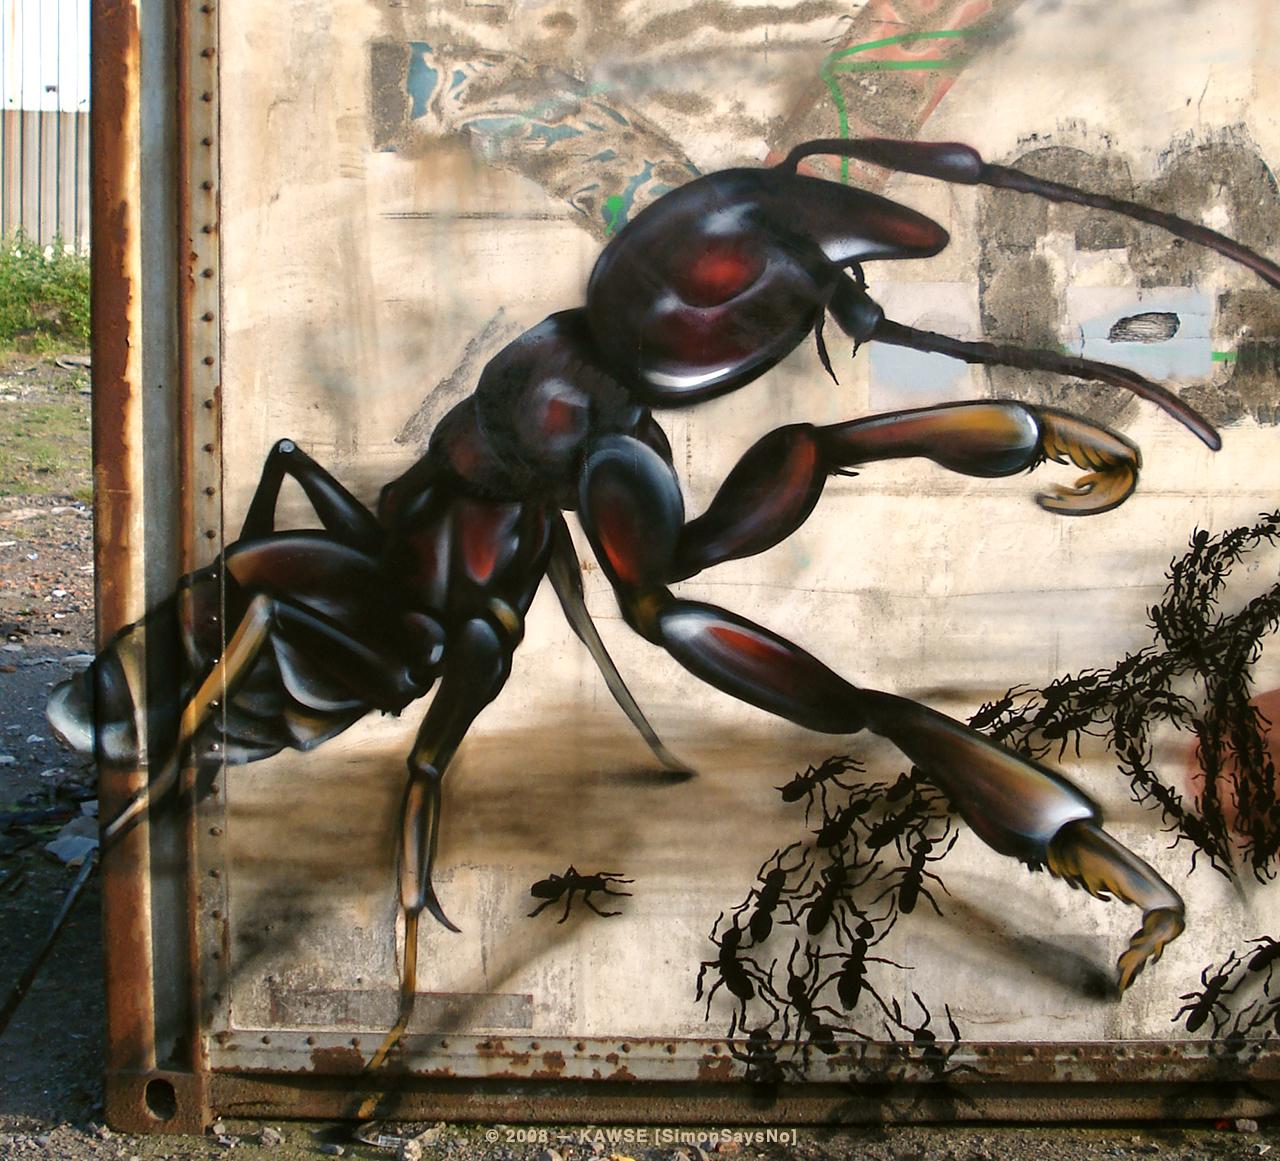 KAWSE 2008 — ANTS [Graffiti]